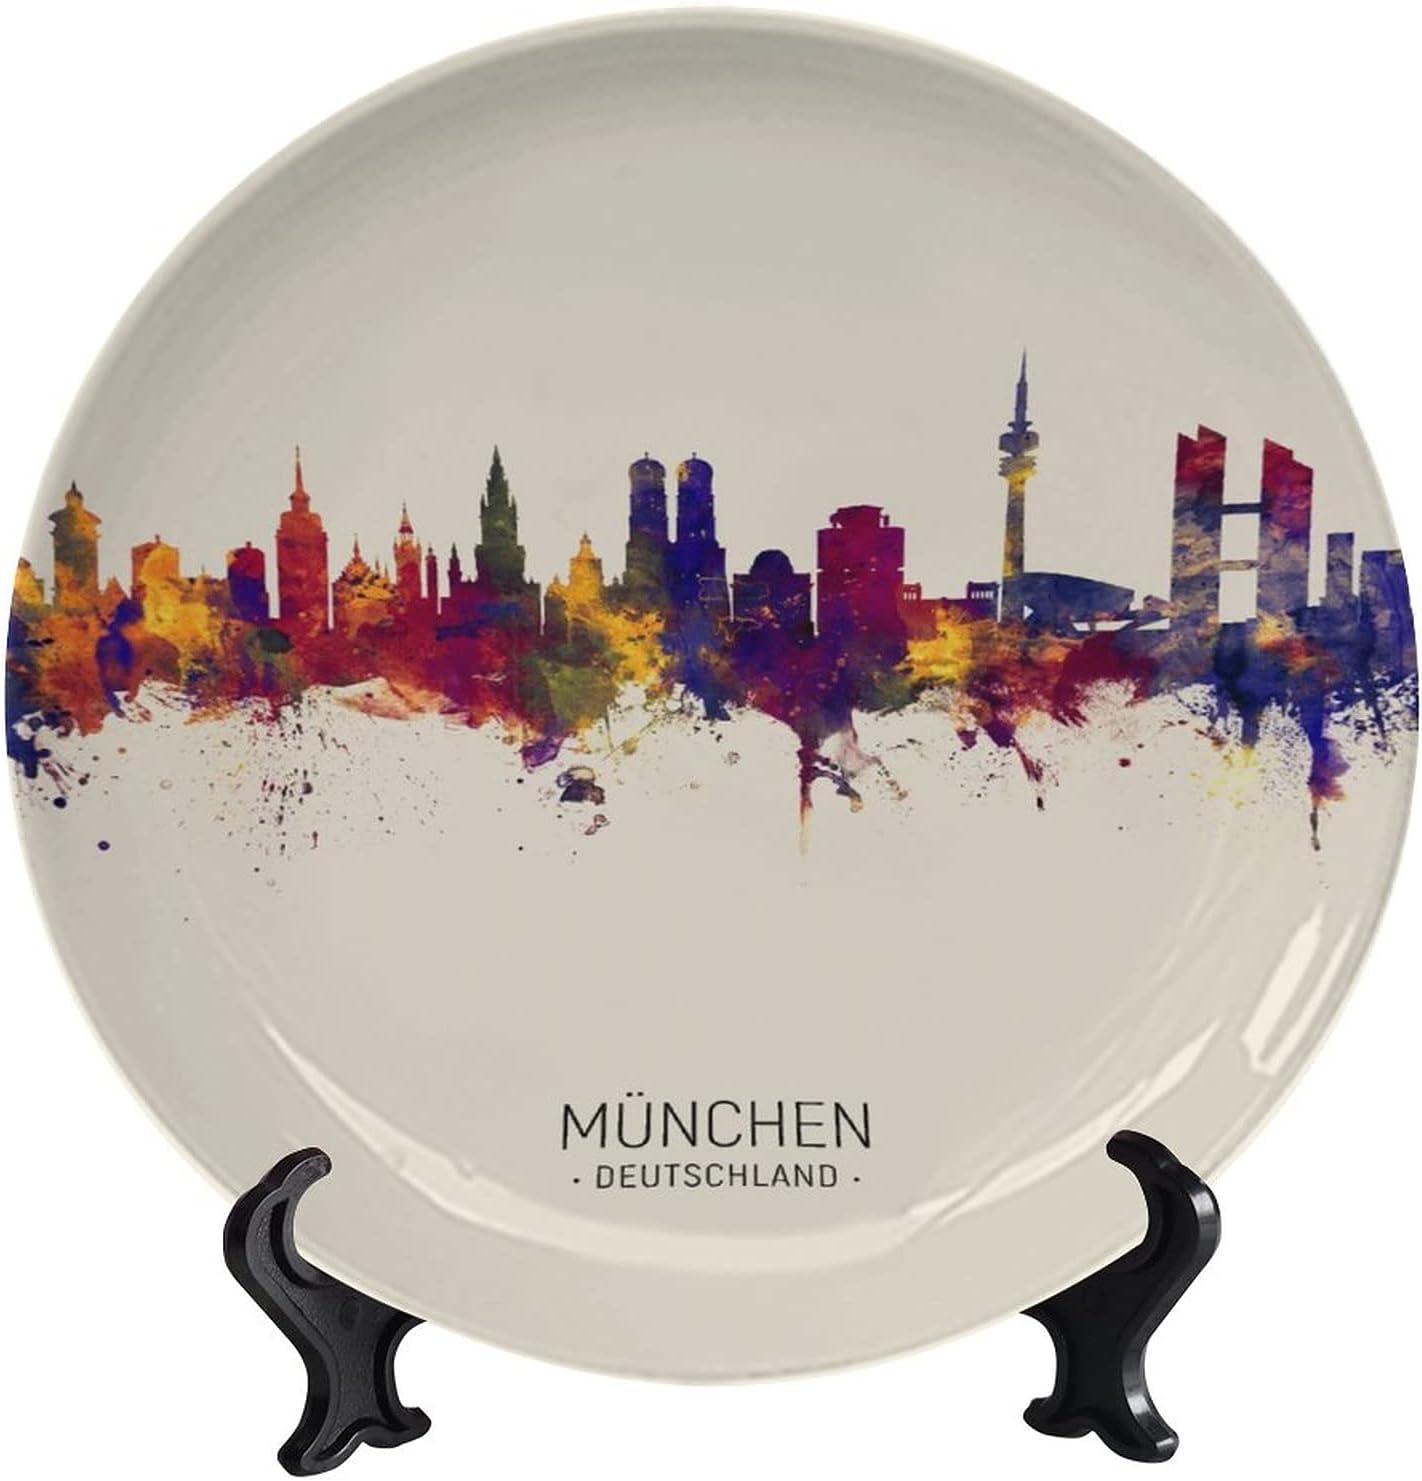 Popularity wonderr Munich Germany Skyline Waterc Fresno Mall Vintage Decorative Plates